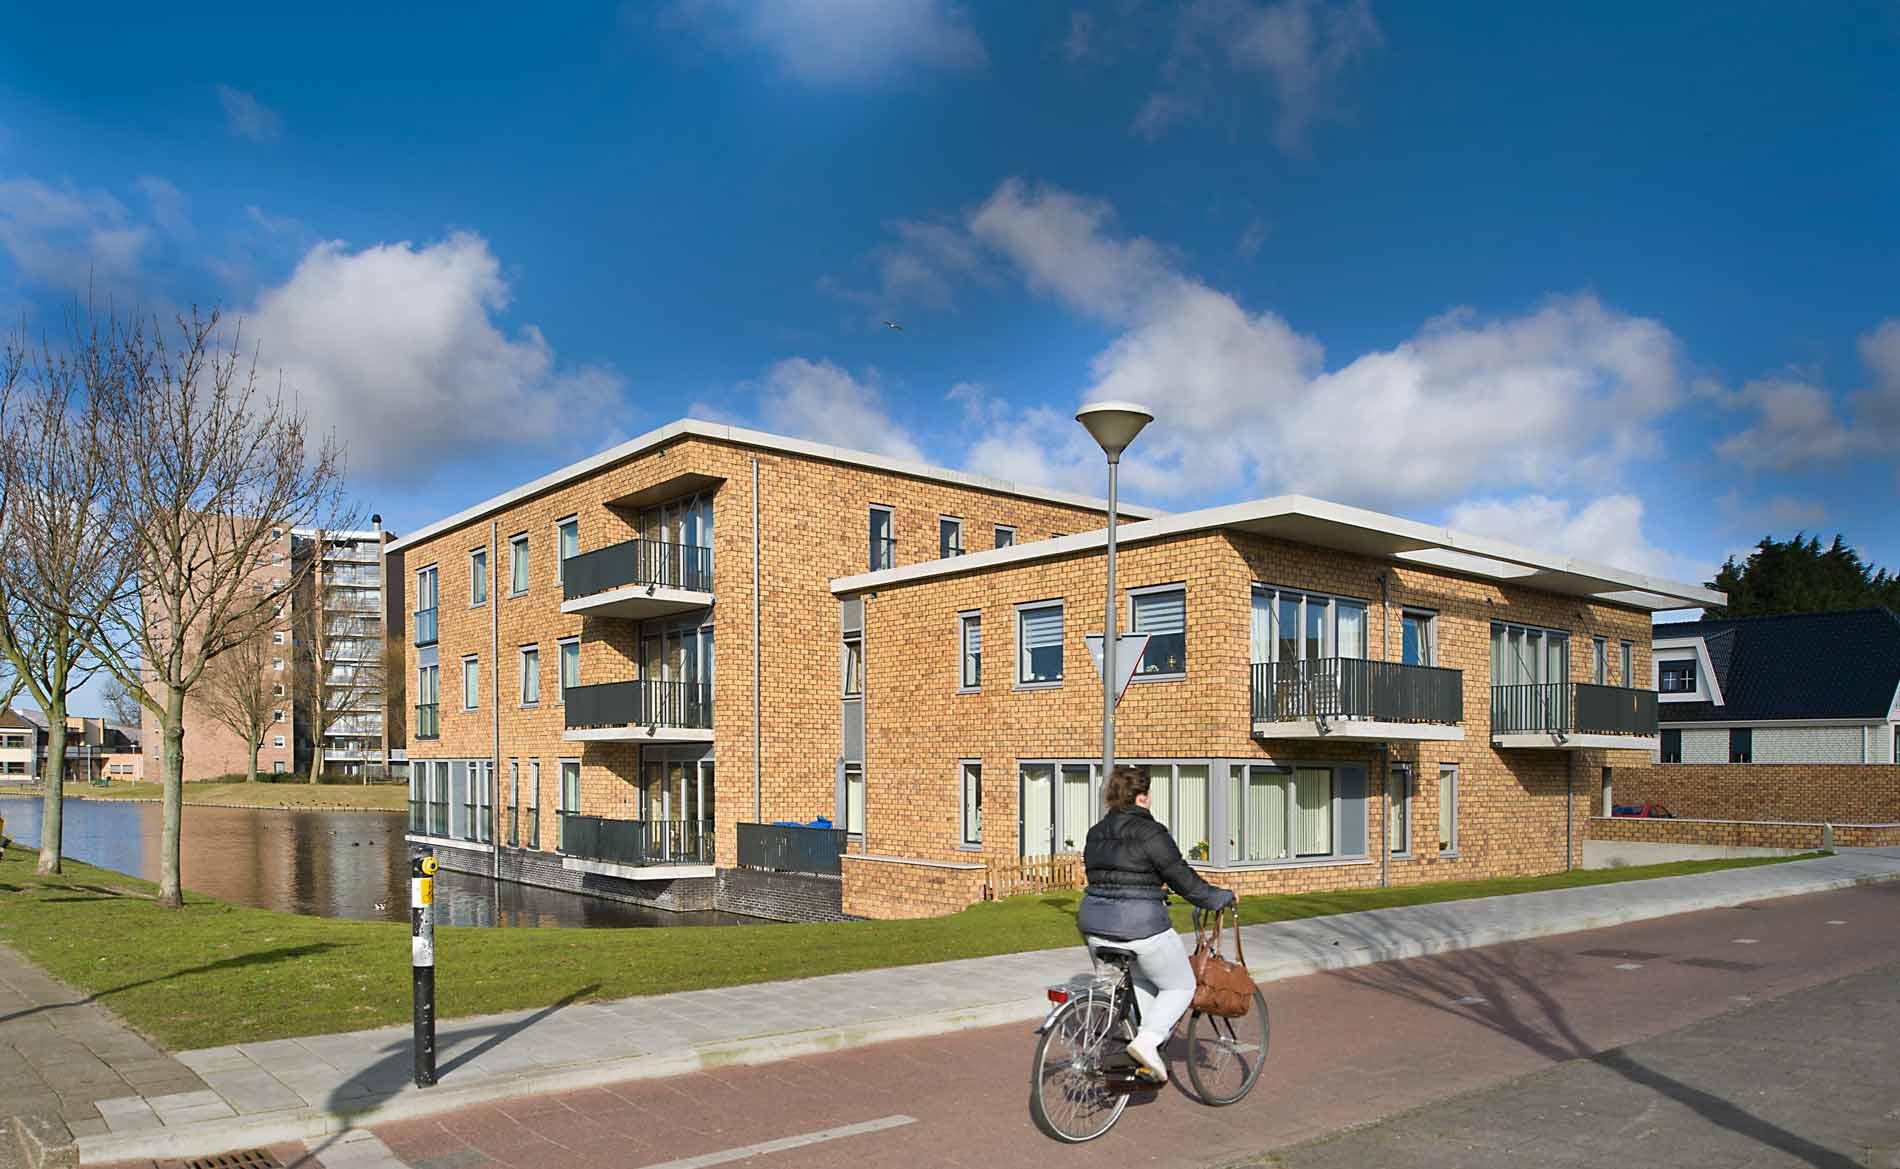 architect woningbouw Brugwoningen appartementen ouderenhuisvesting modern urban villa Heemskerk BBHD architecten WoonopMaat